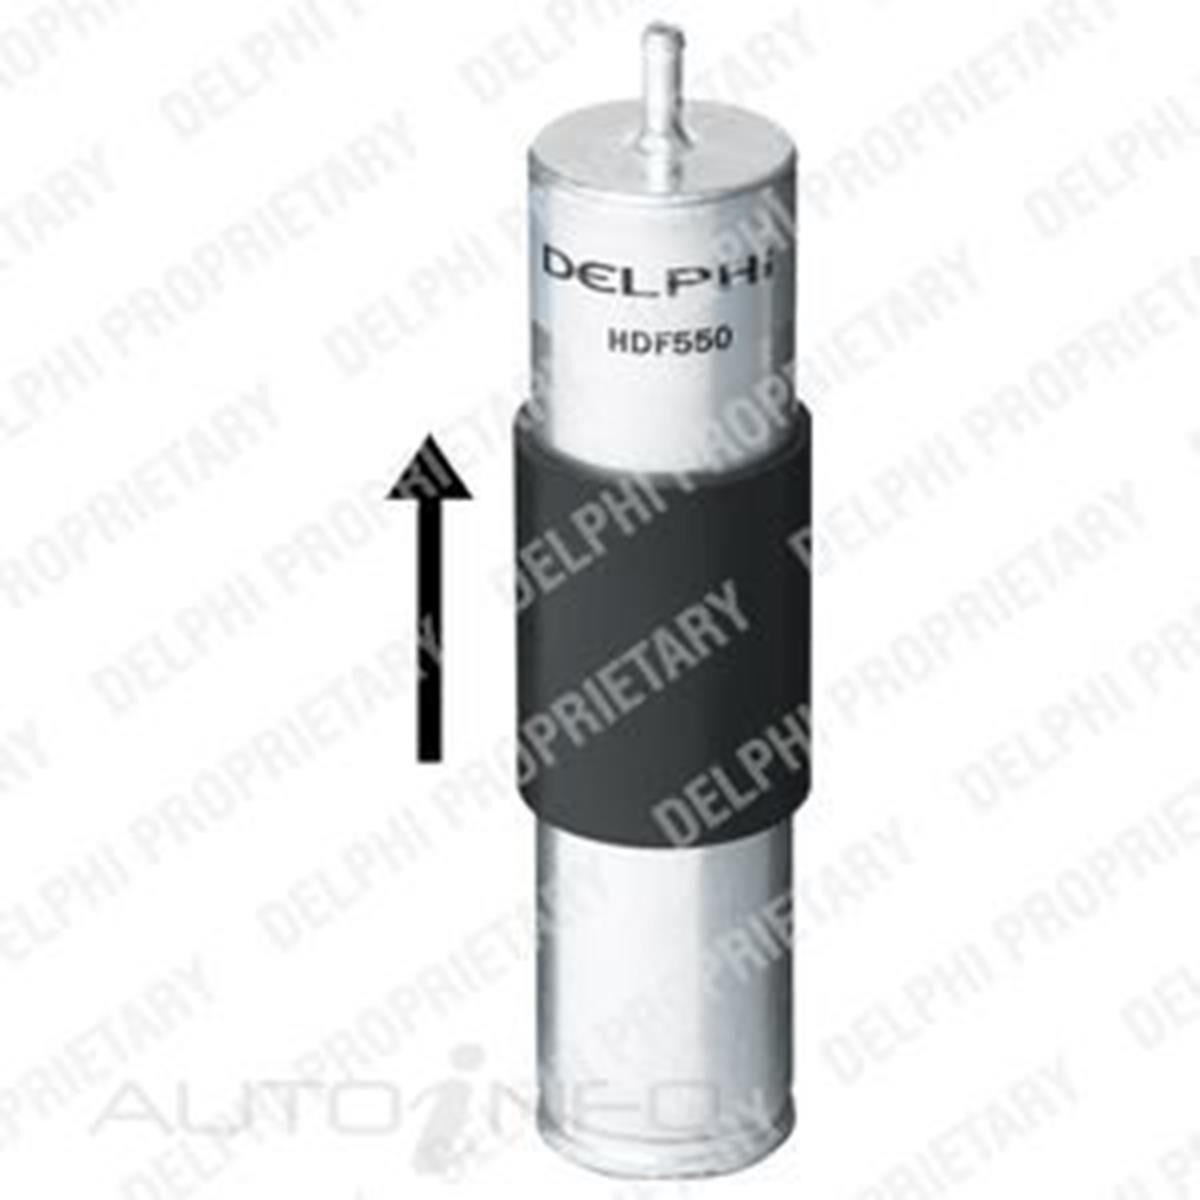 Delphi Diesel Filter HDF550 Part No